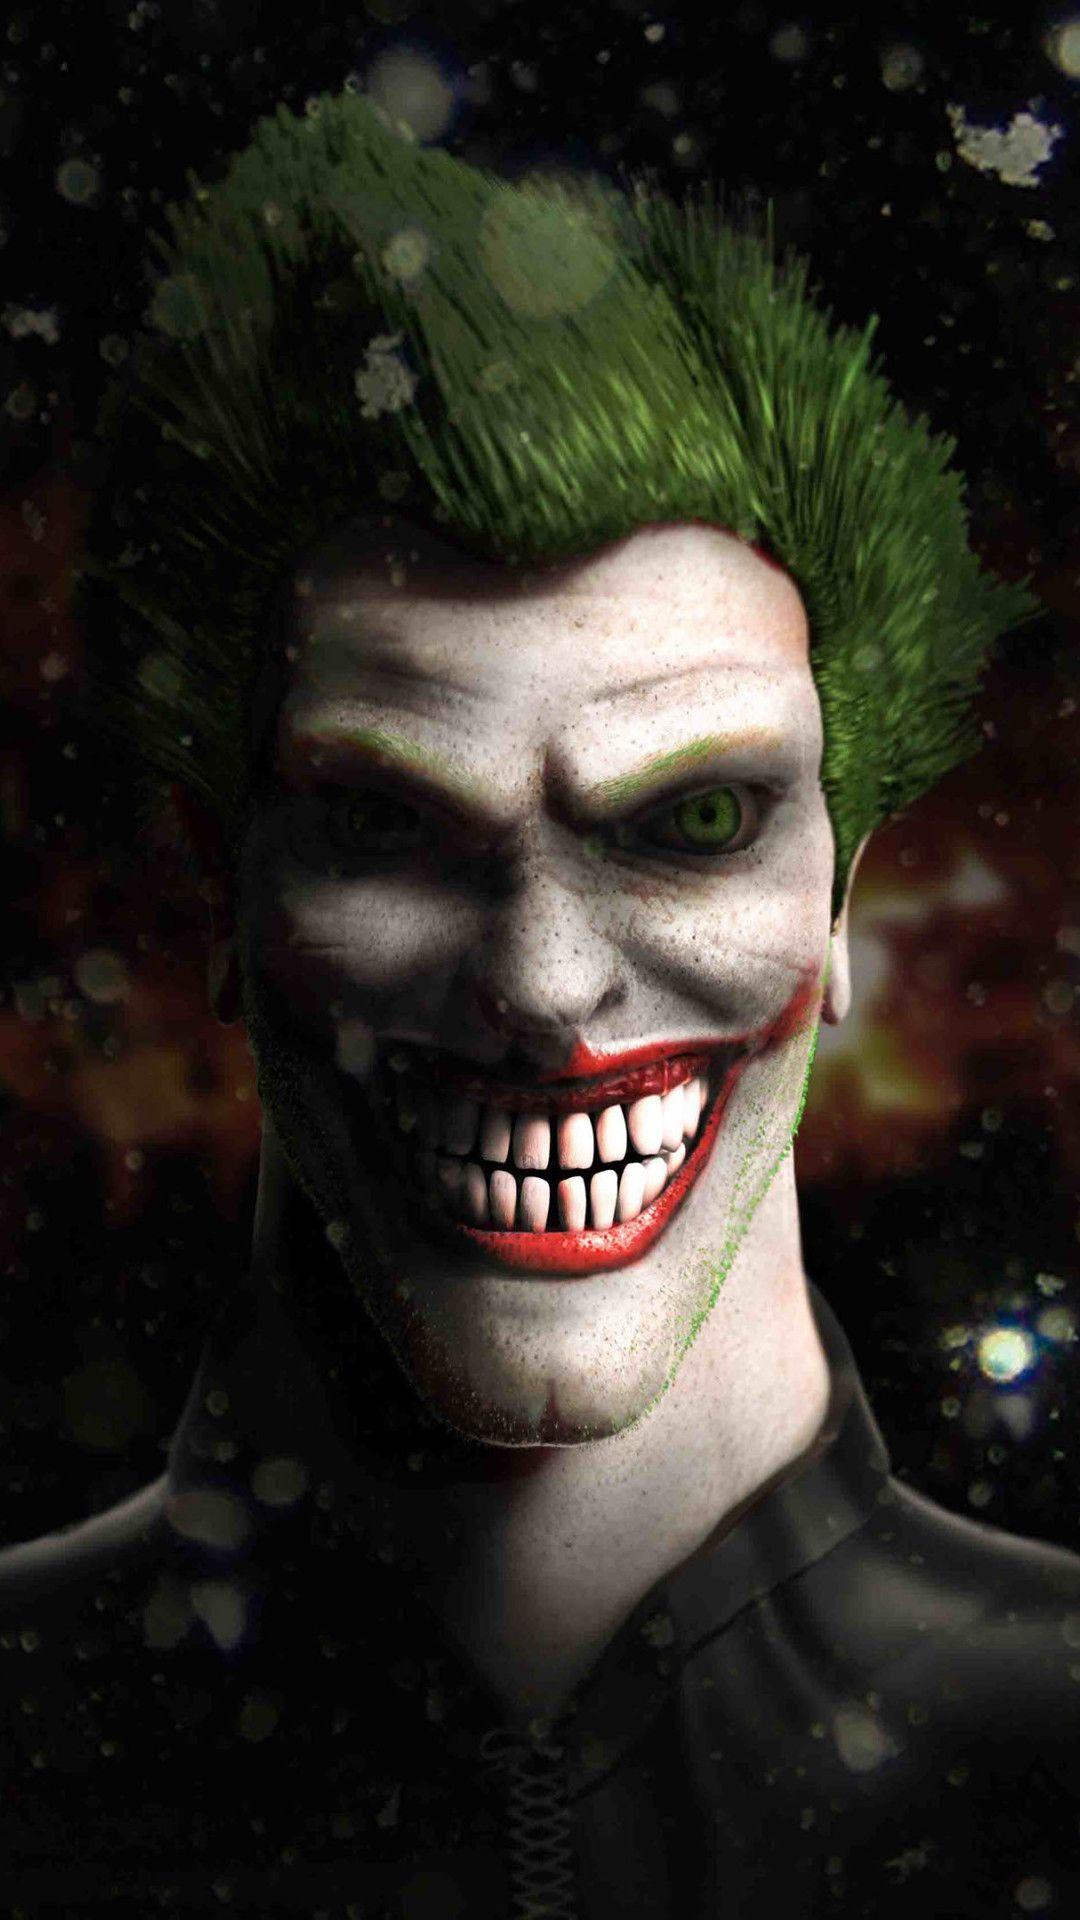 Joker Fan Art 4k Mobile Wallpaper (iPhone, Android